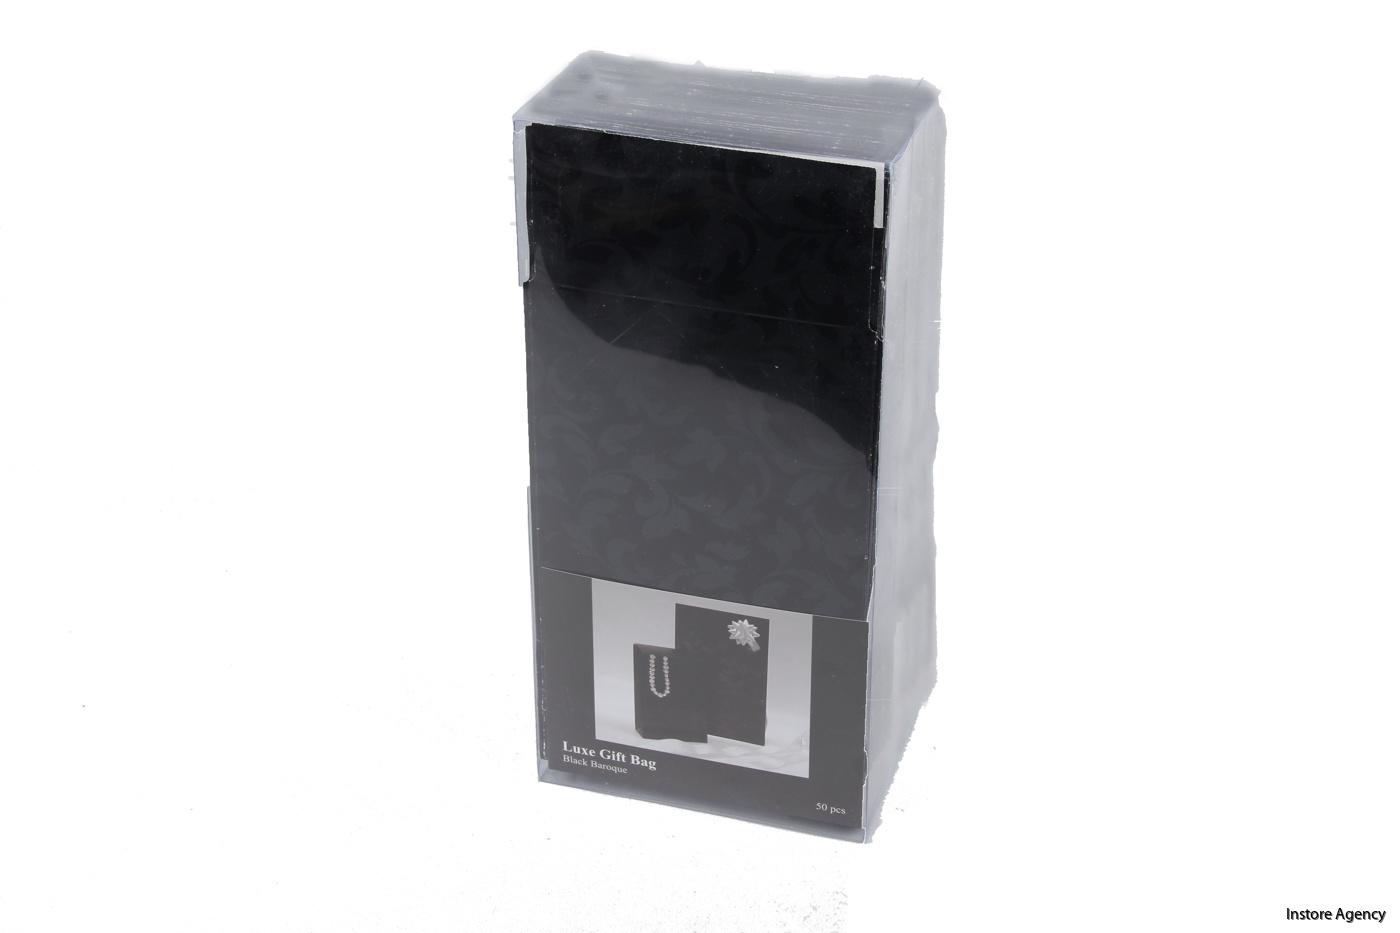 GB-140623-999BAR  01